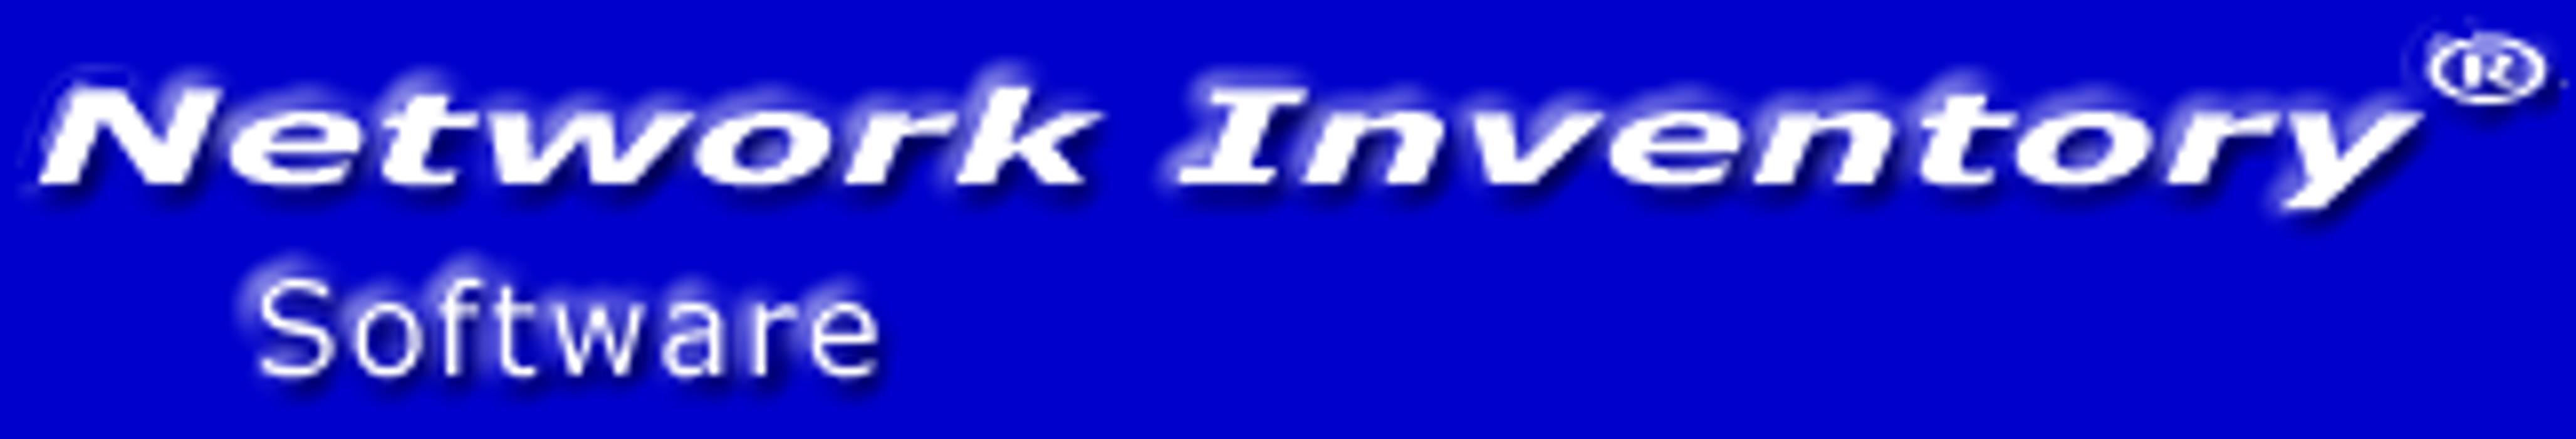 Network-Inventory